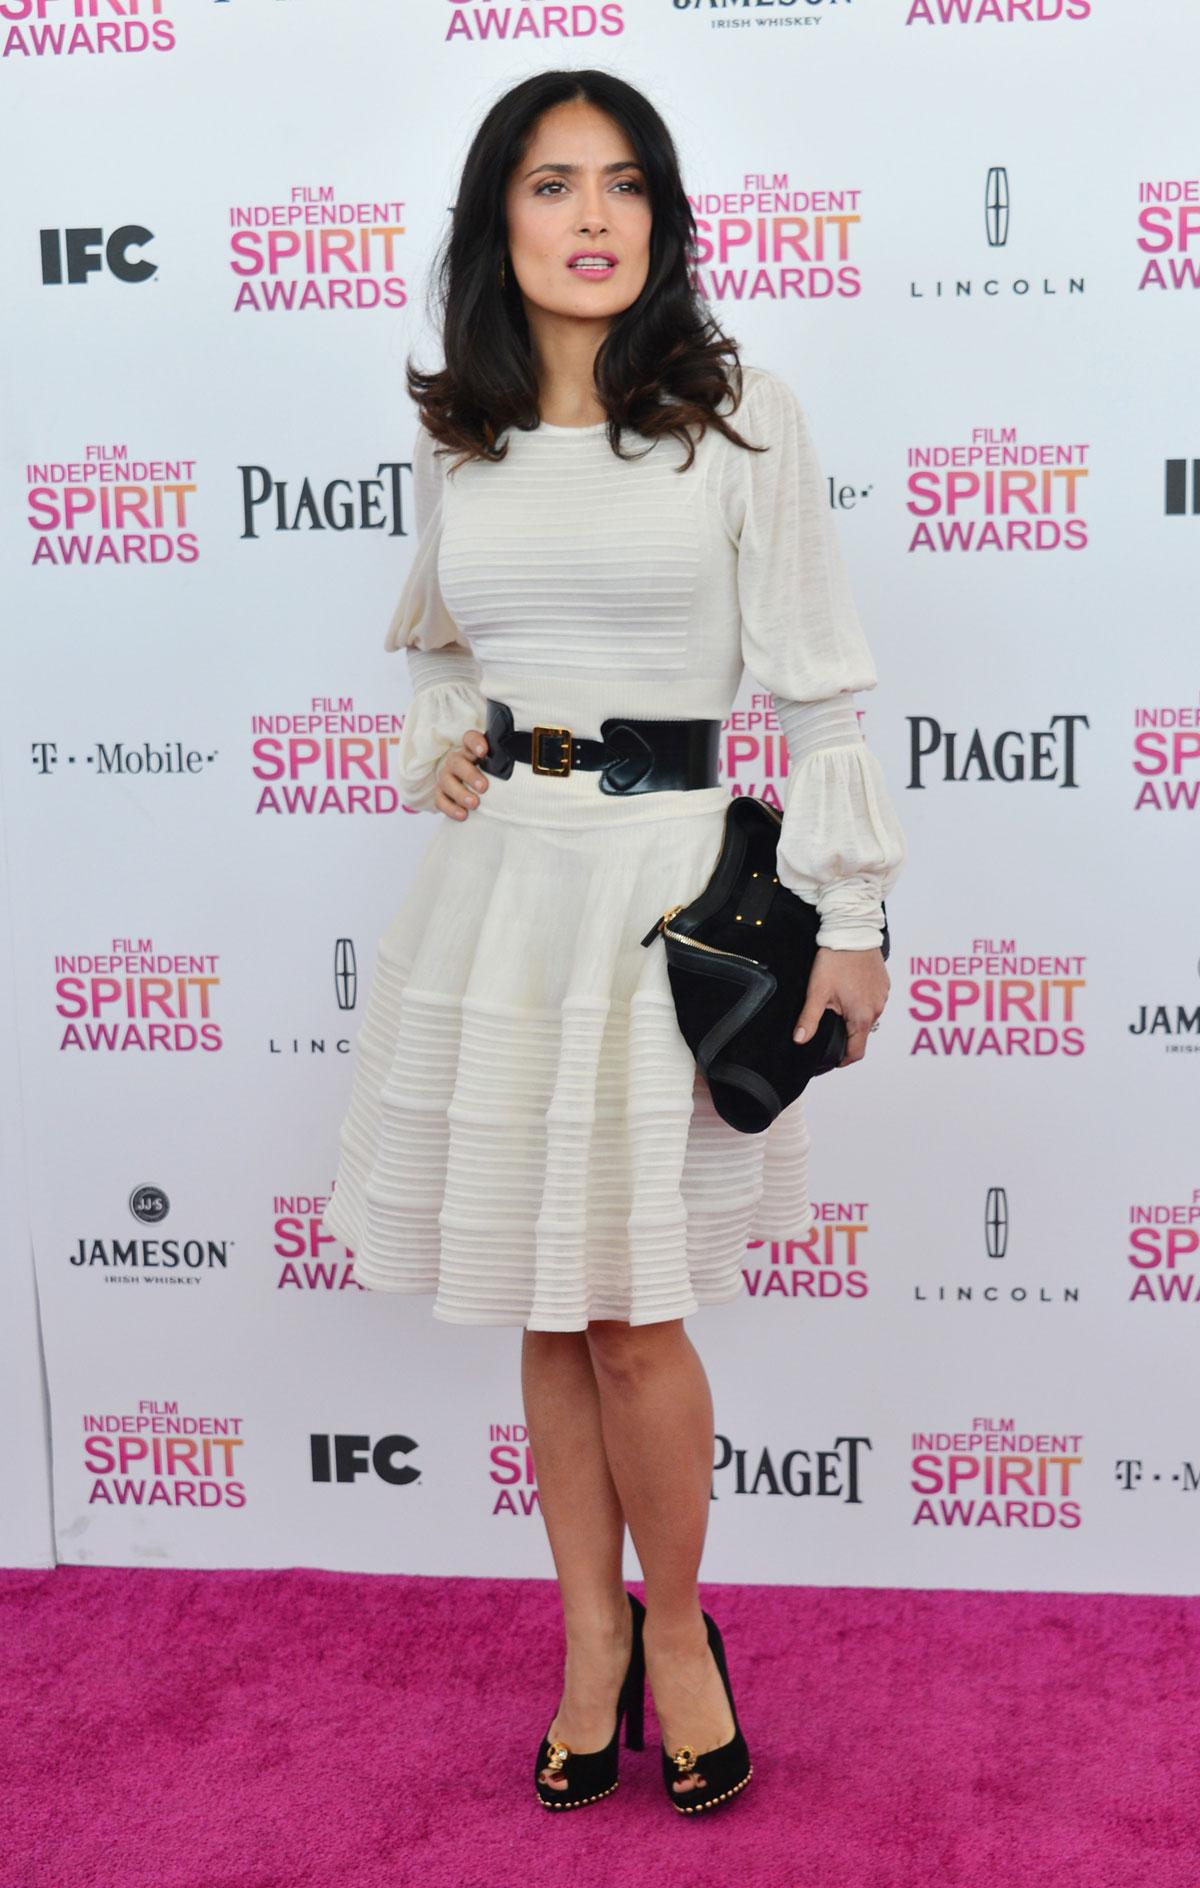 SALMA HAYEK at 2013 Film Independent Spirit Awards in Santa Monica